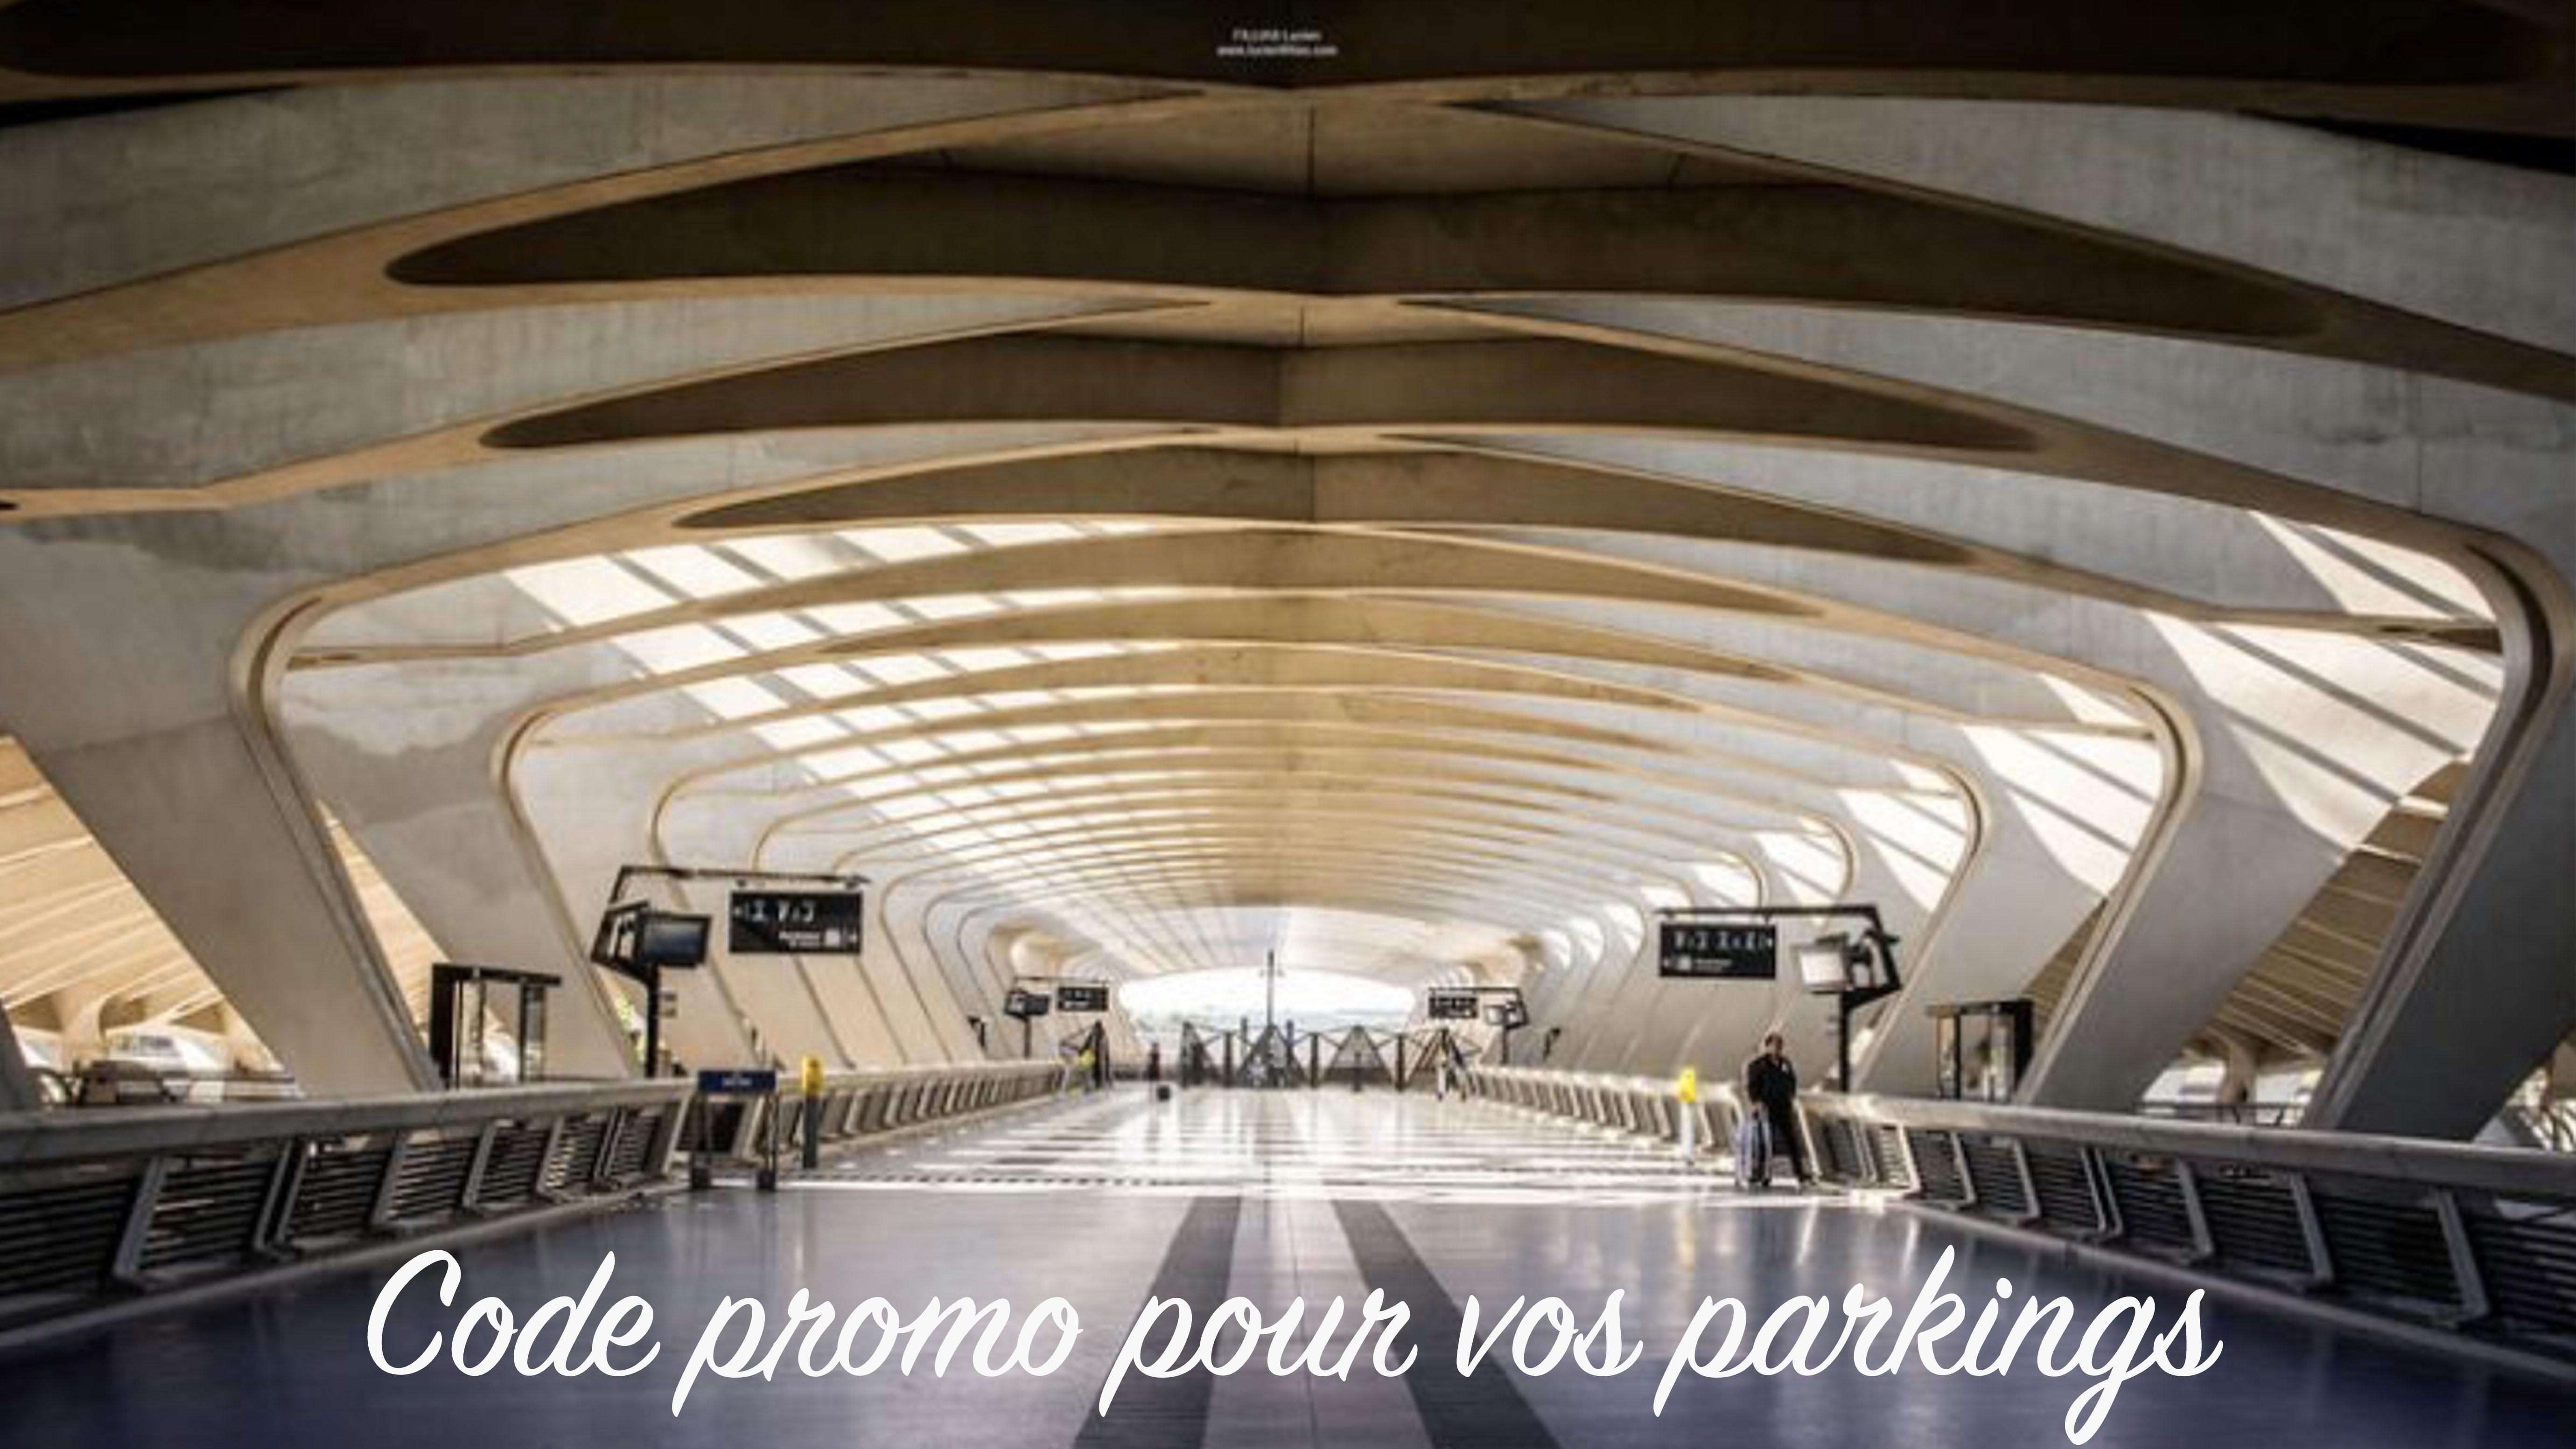 Code promo One Park